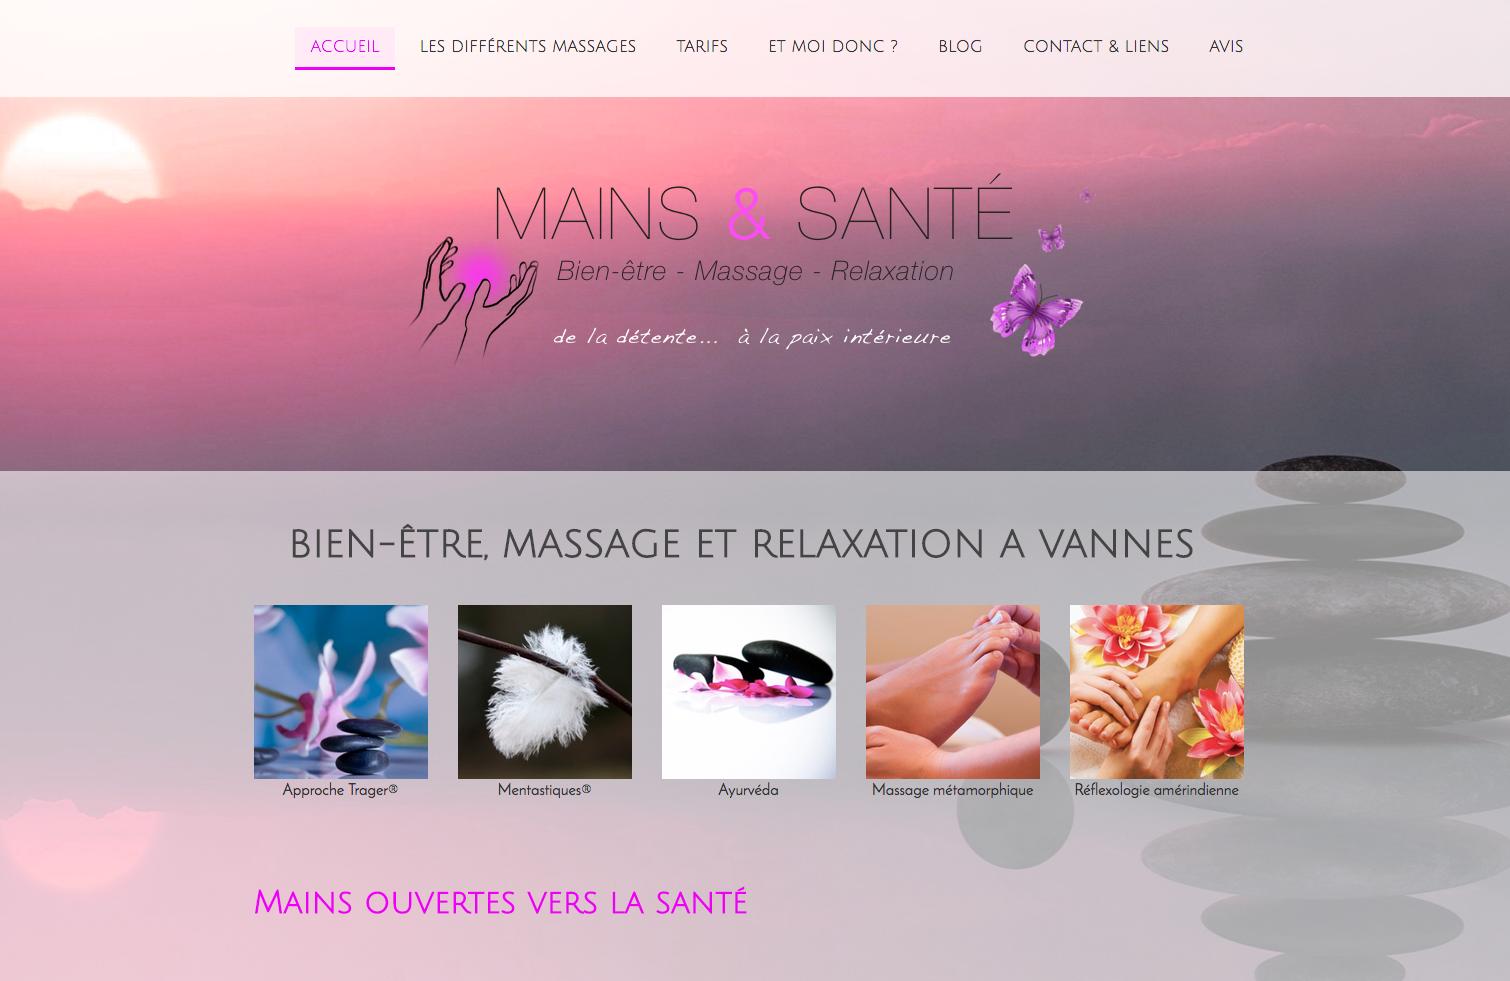 http://www.mains-et-sante.org